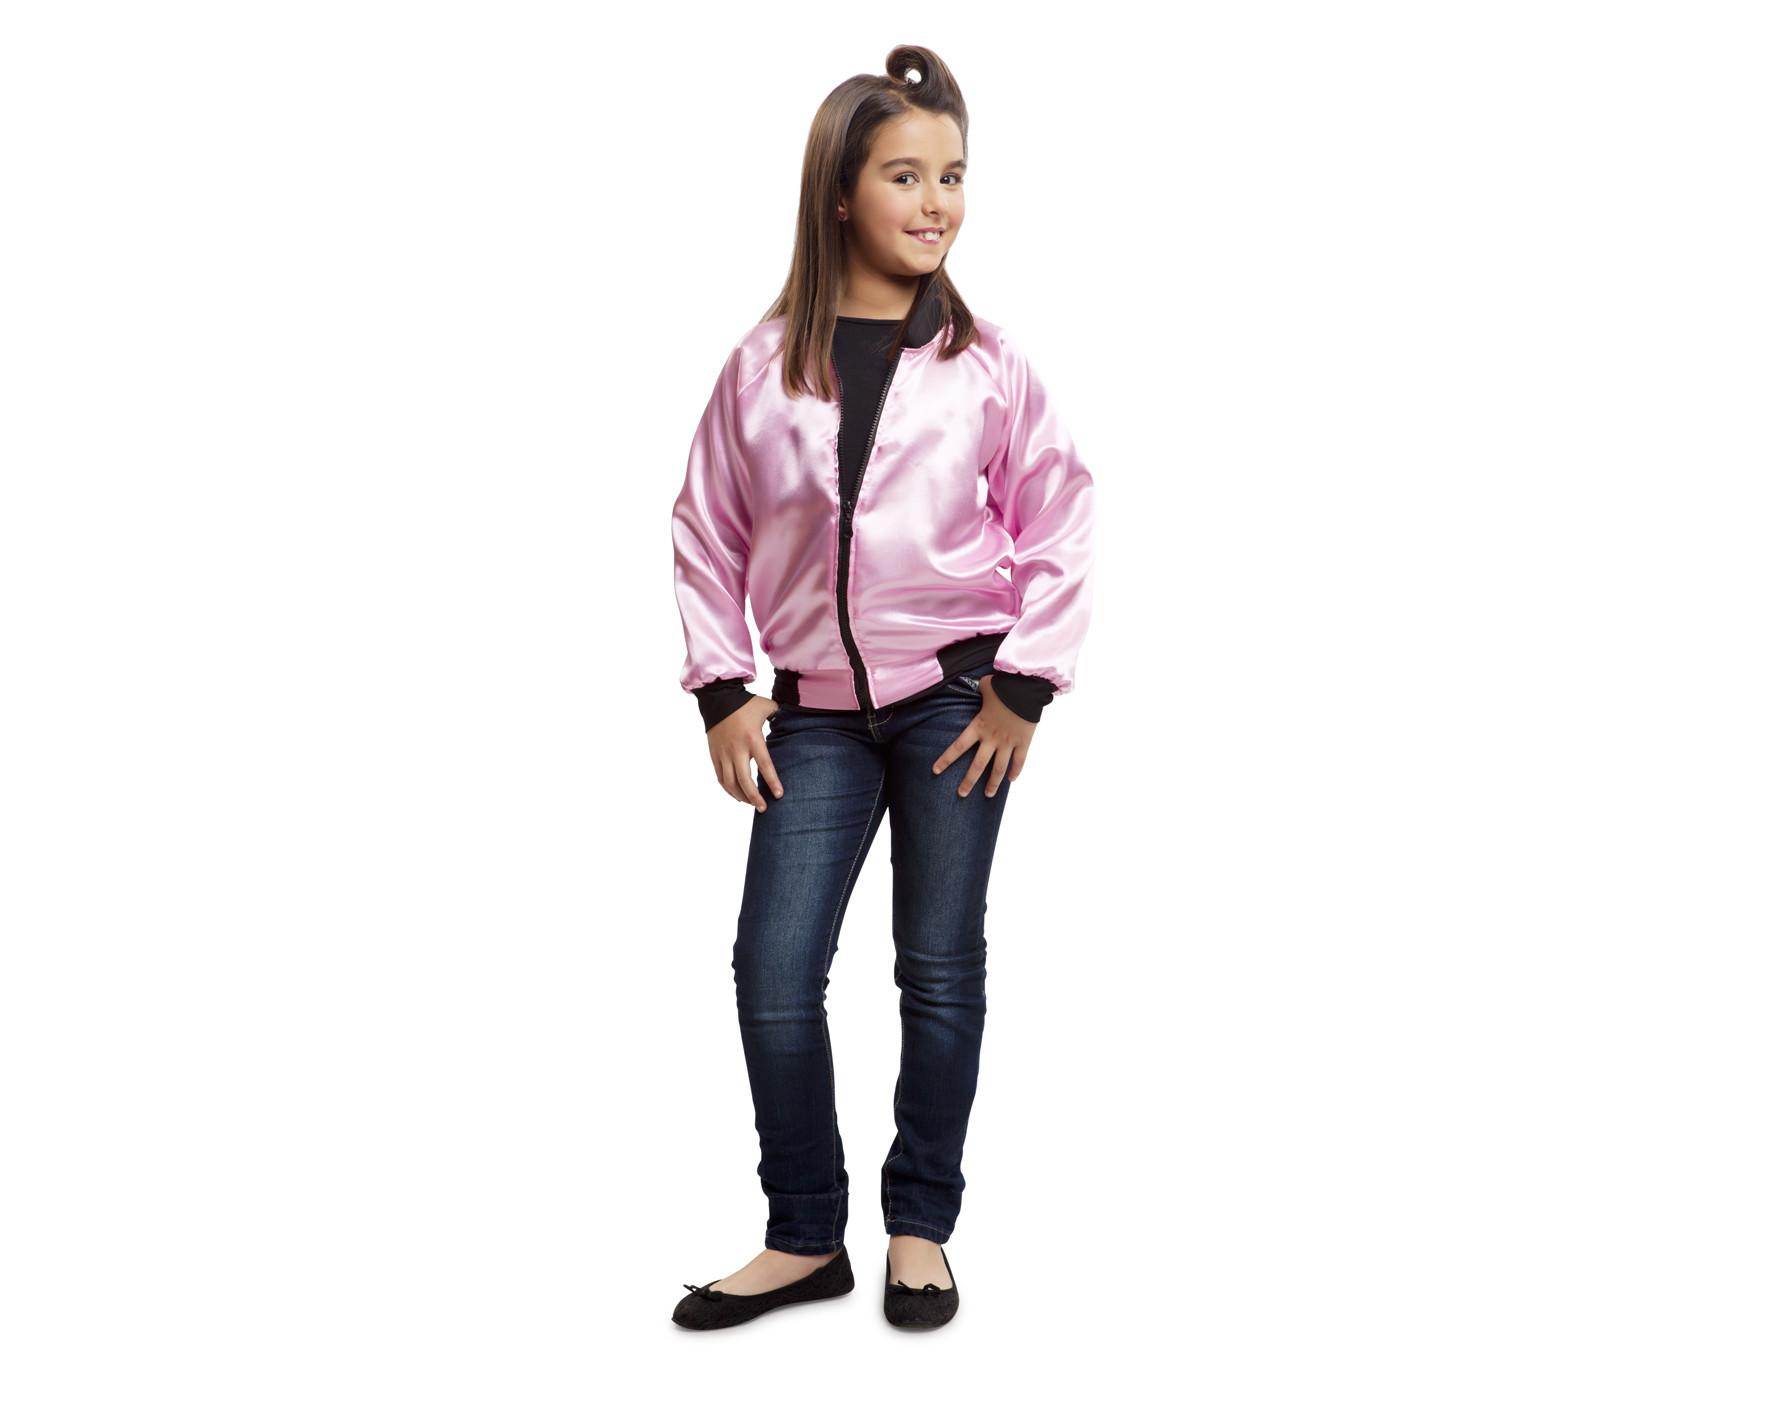 Lady Grease Parejas Disfraces Pink Cazadora De Niña Para pOqAEAwt 7ecb0a97cc36f